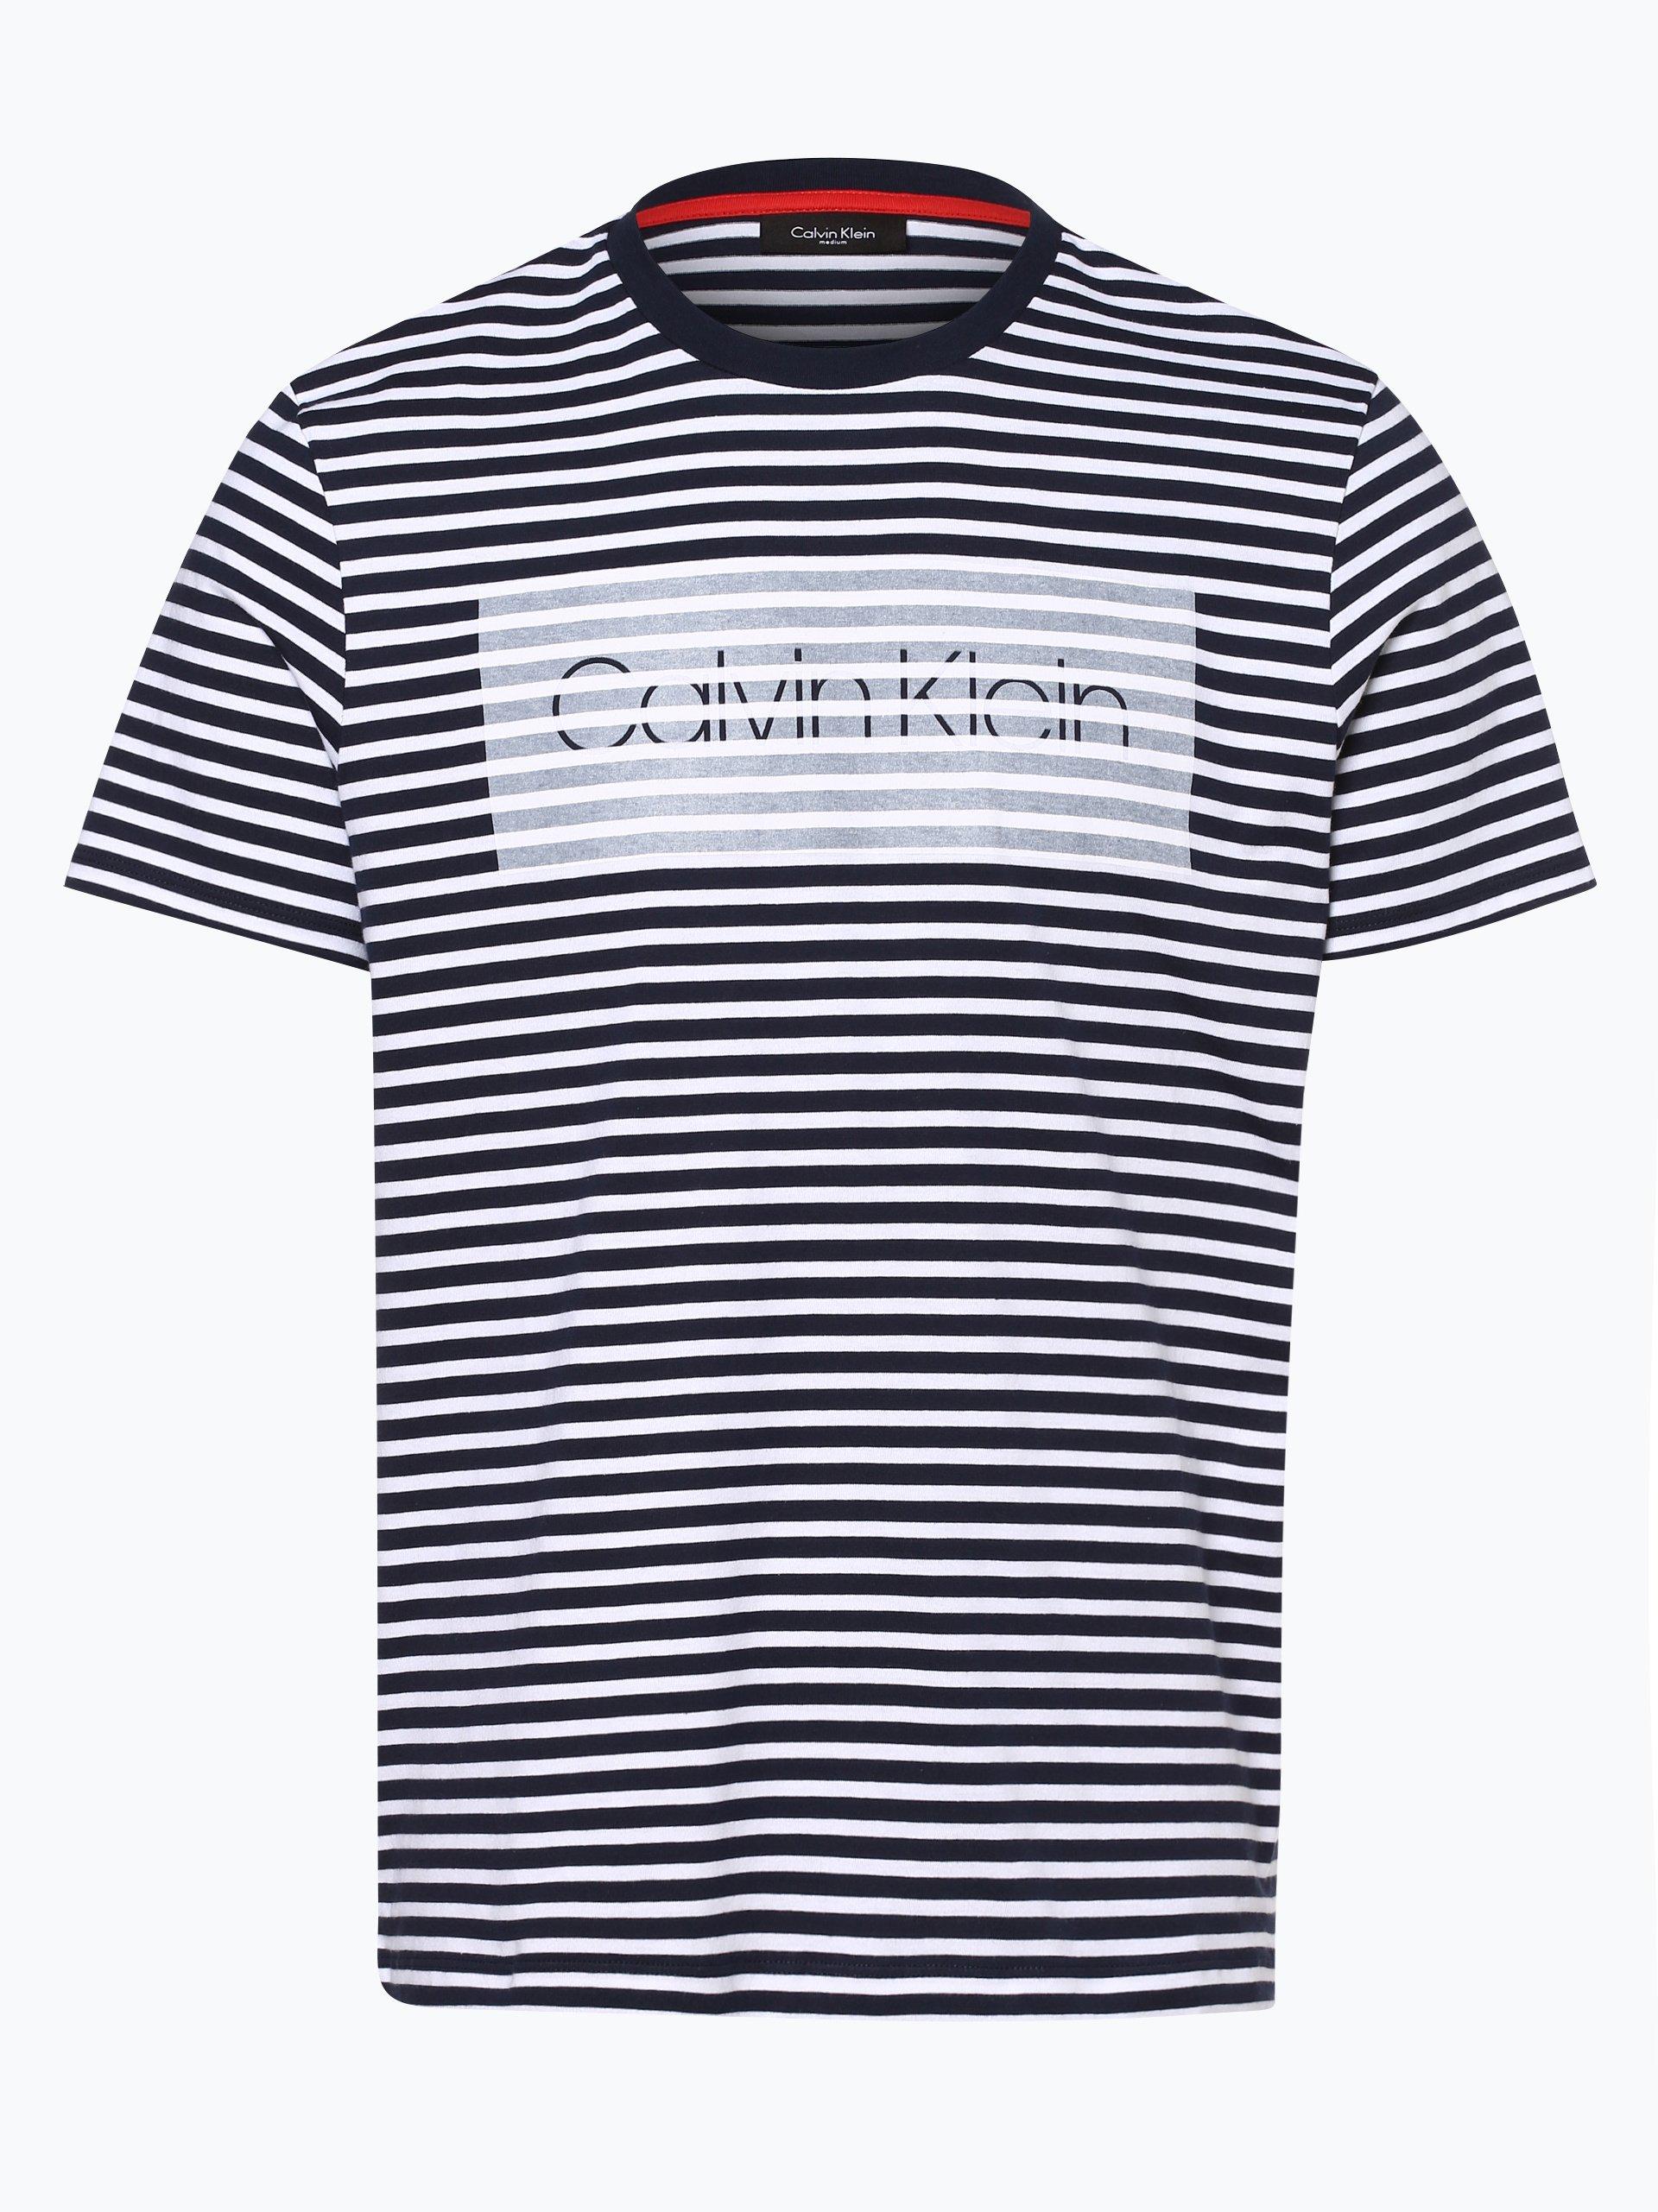 Calvin Klein Herren T-Shirt - Jaksat